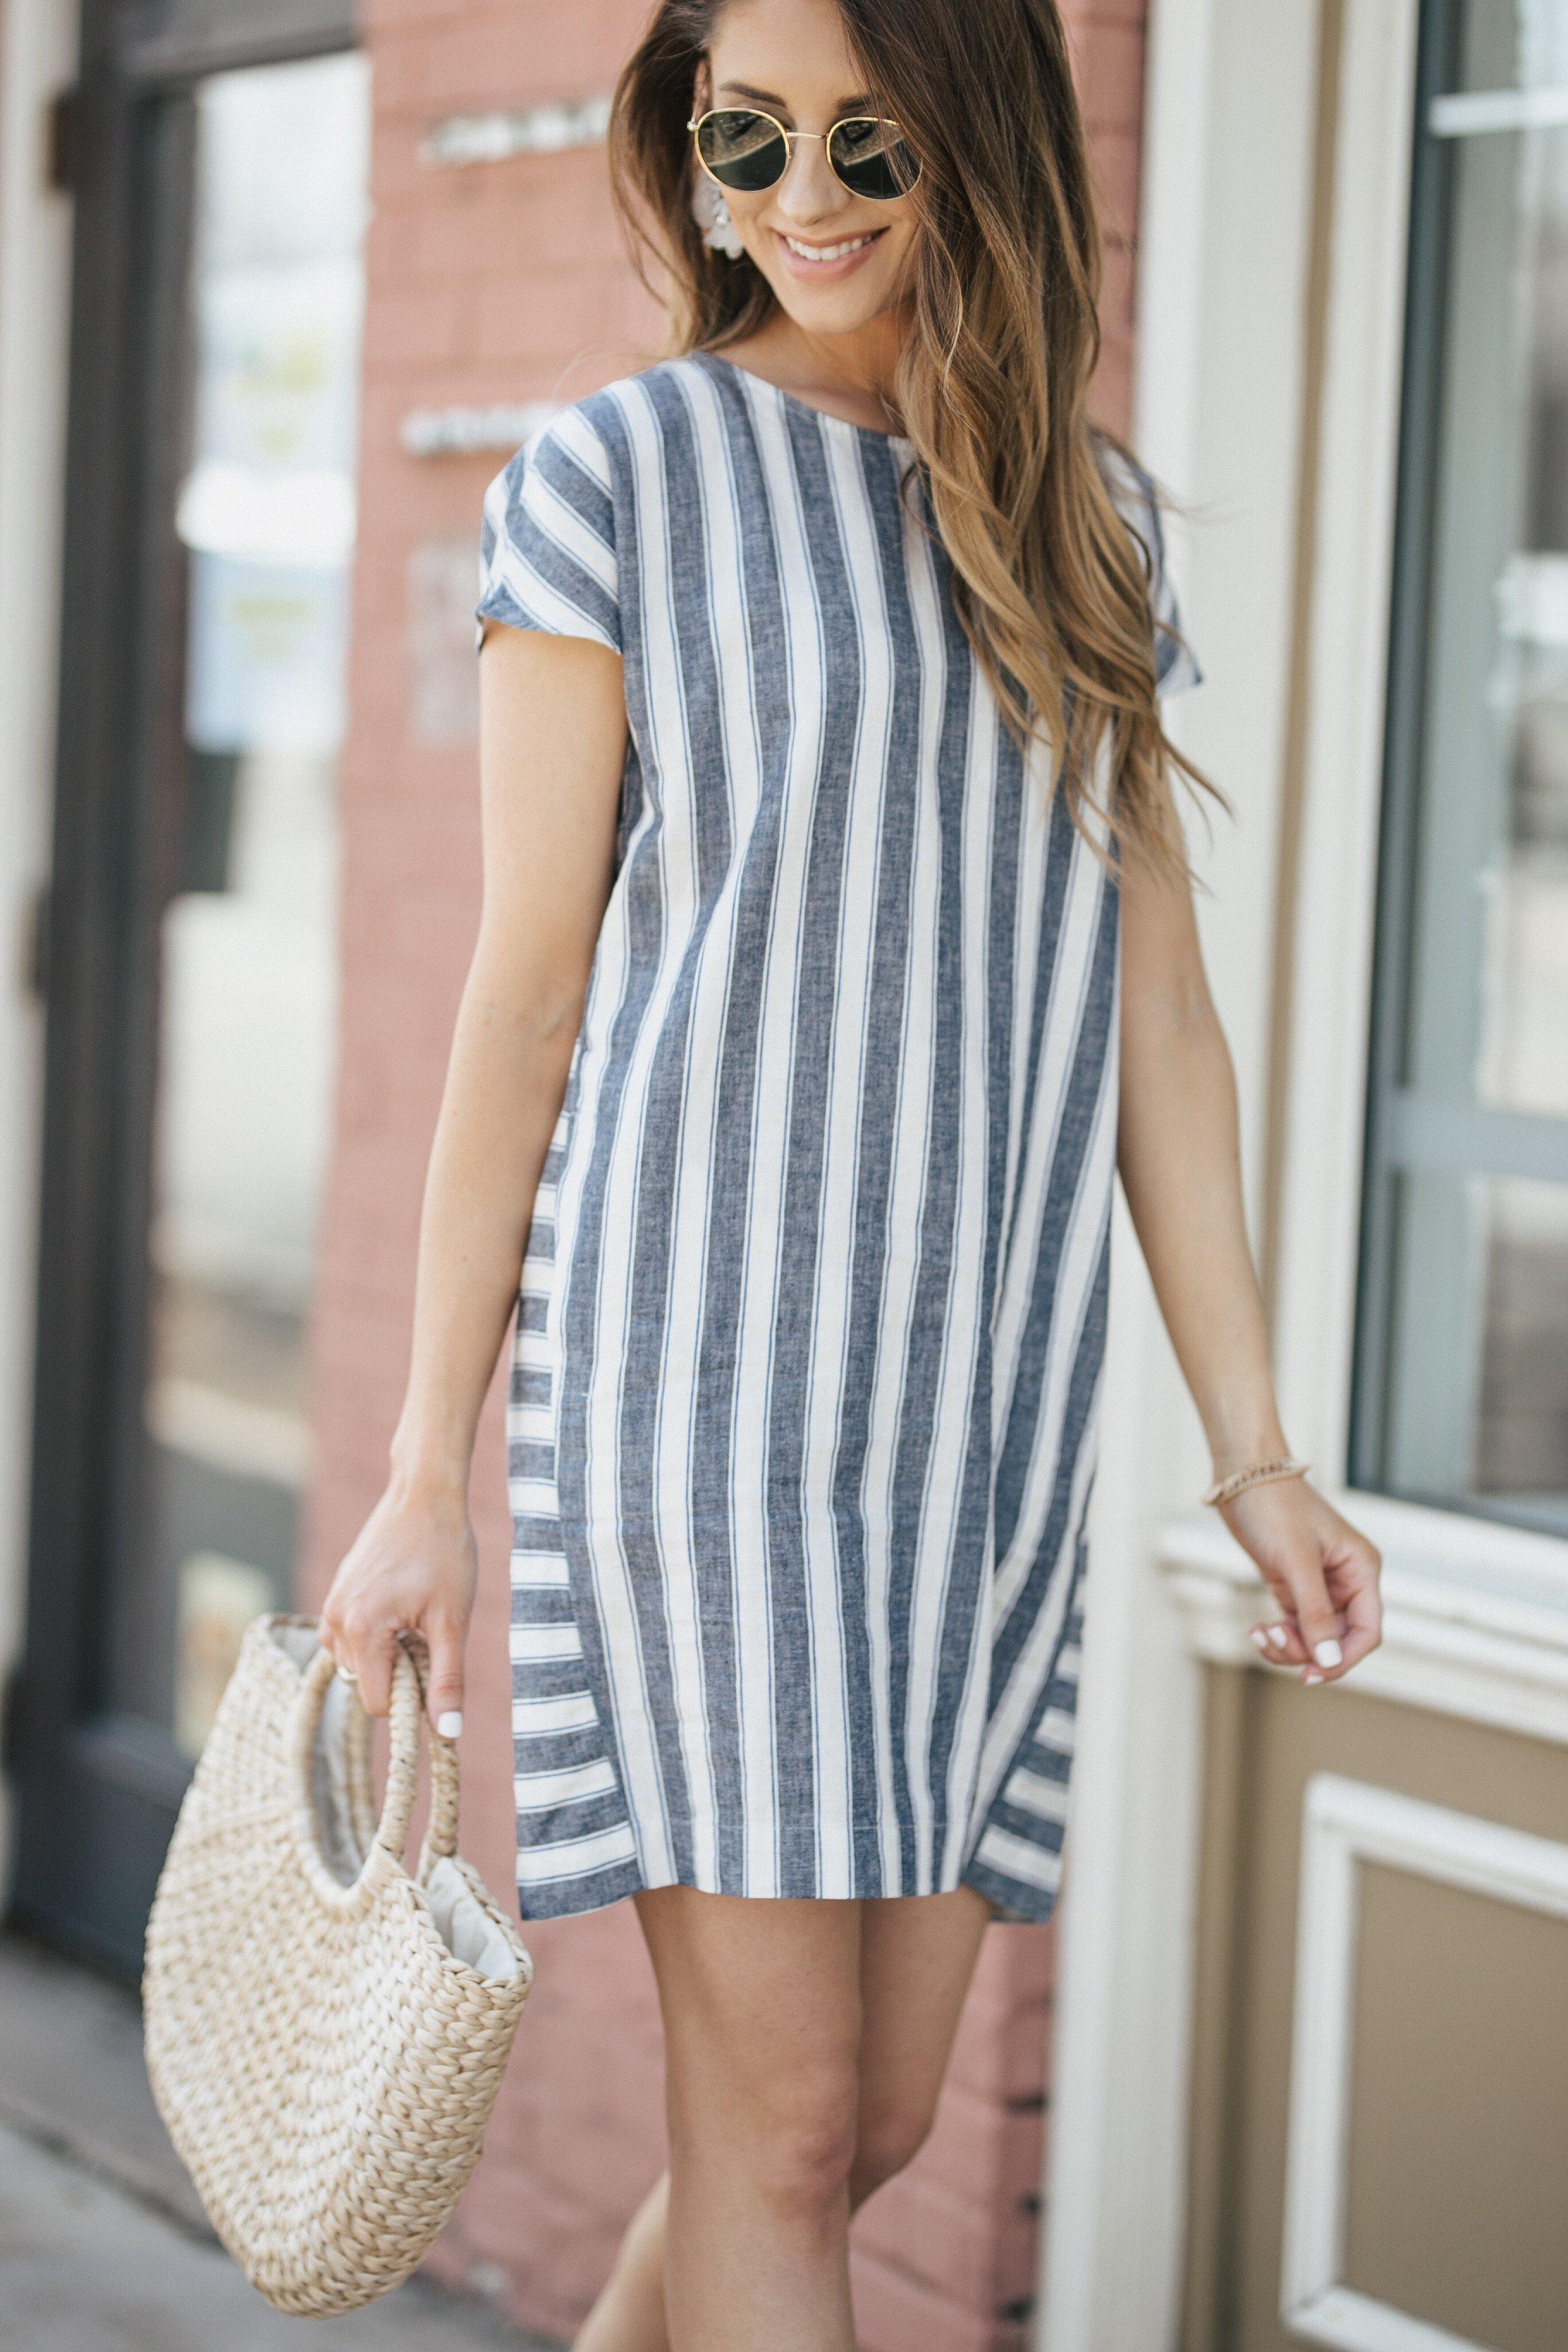 Striped Madewell Dress